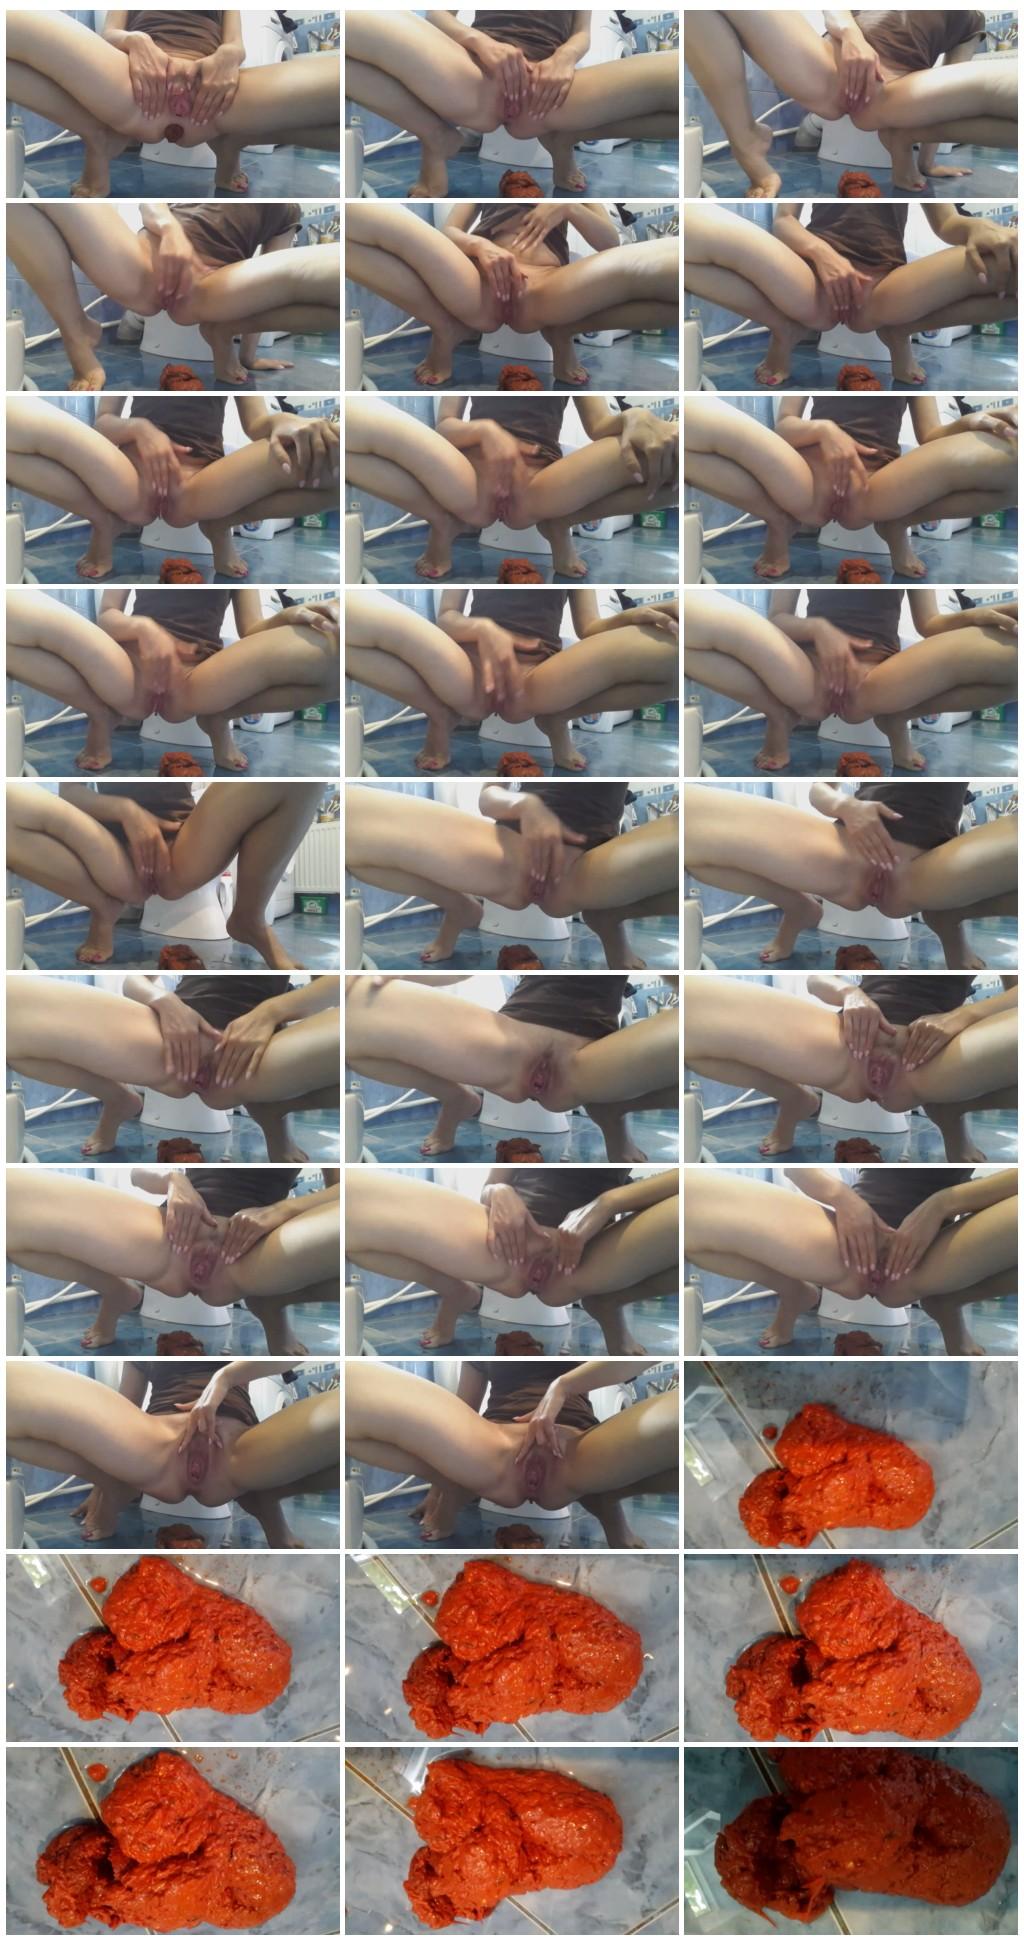 Open Mouth 4 Shit panthergodess Big Shit Pile Piss video New Scat Video thumb - Open Mouth 4 Shit - panthergodess [Big Shit Pile, Piss video, New Scat Video]